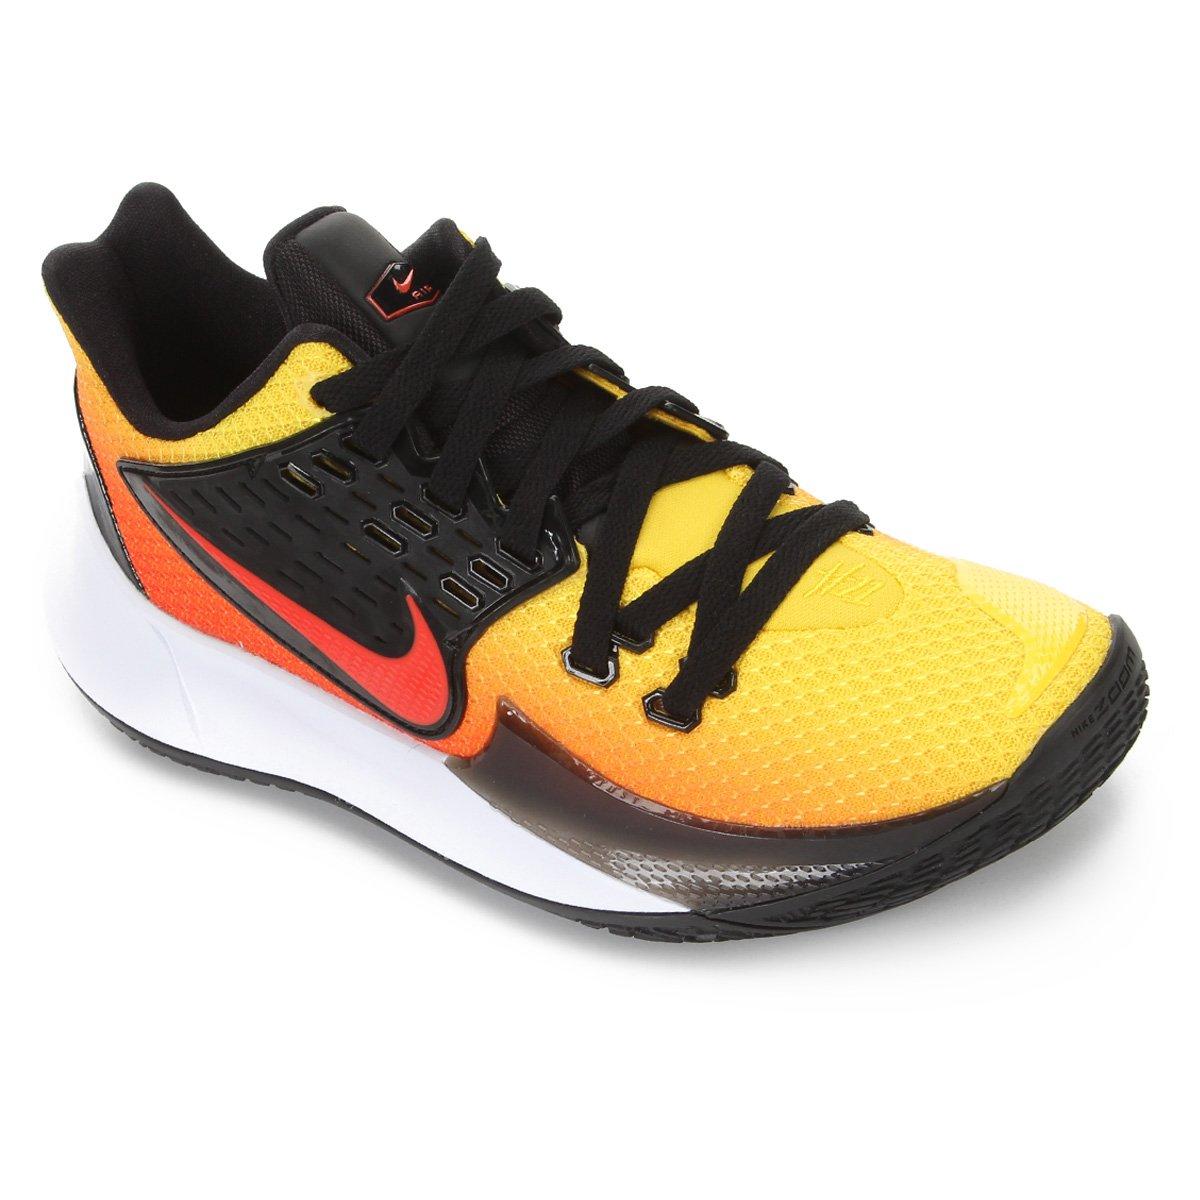 Tênis Nike Kyrie Irving Flytrap Low 2 Masculino